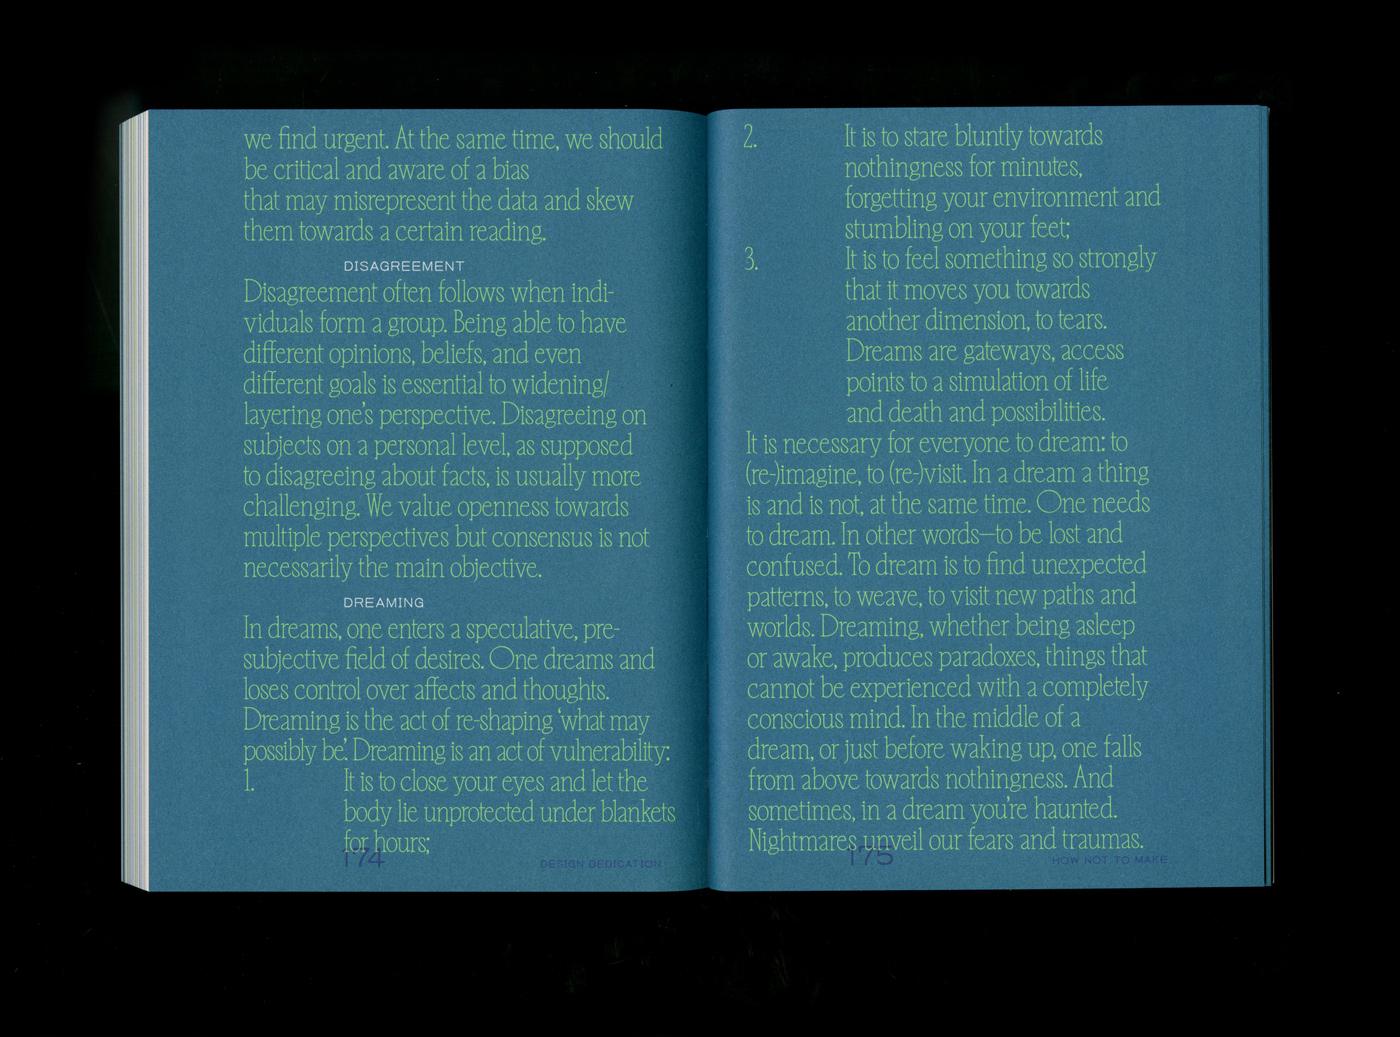 16 collide24 Tessa Meeus Alex Walker Design Dedication - Tessa Meeus and Alex Walker talk us through the creative process behind the book 'Design Dedication', edited by Annelys de Vet and published by Valiz